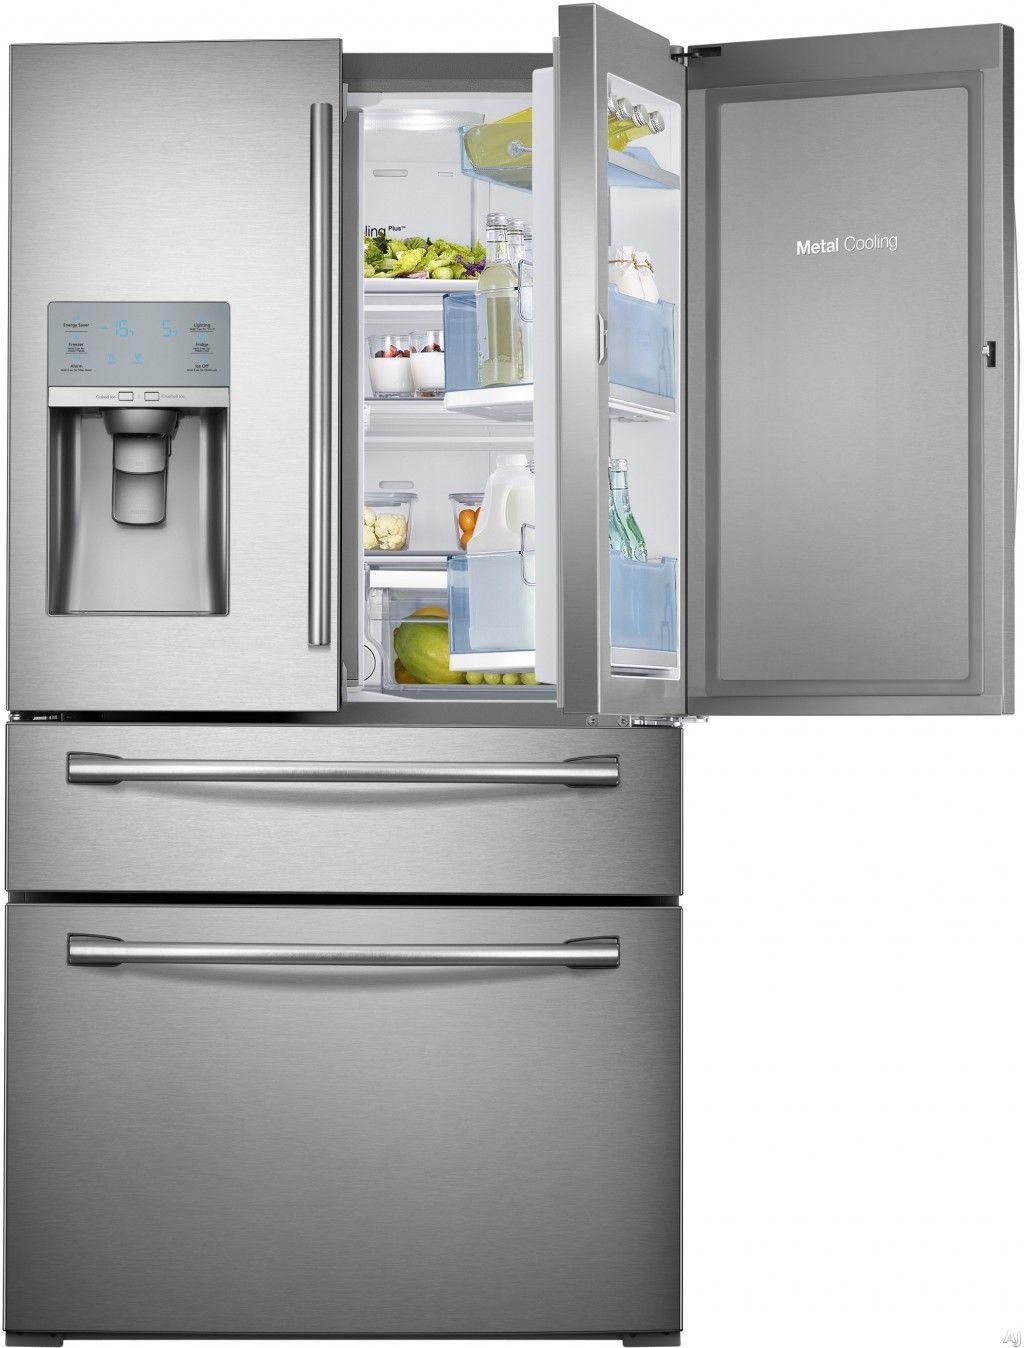 Contemporary Glass Door Fridge Freezer For Home With Samsung